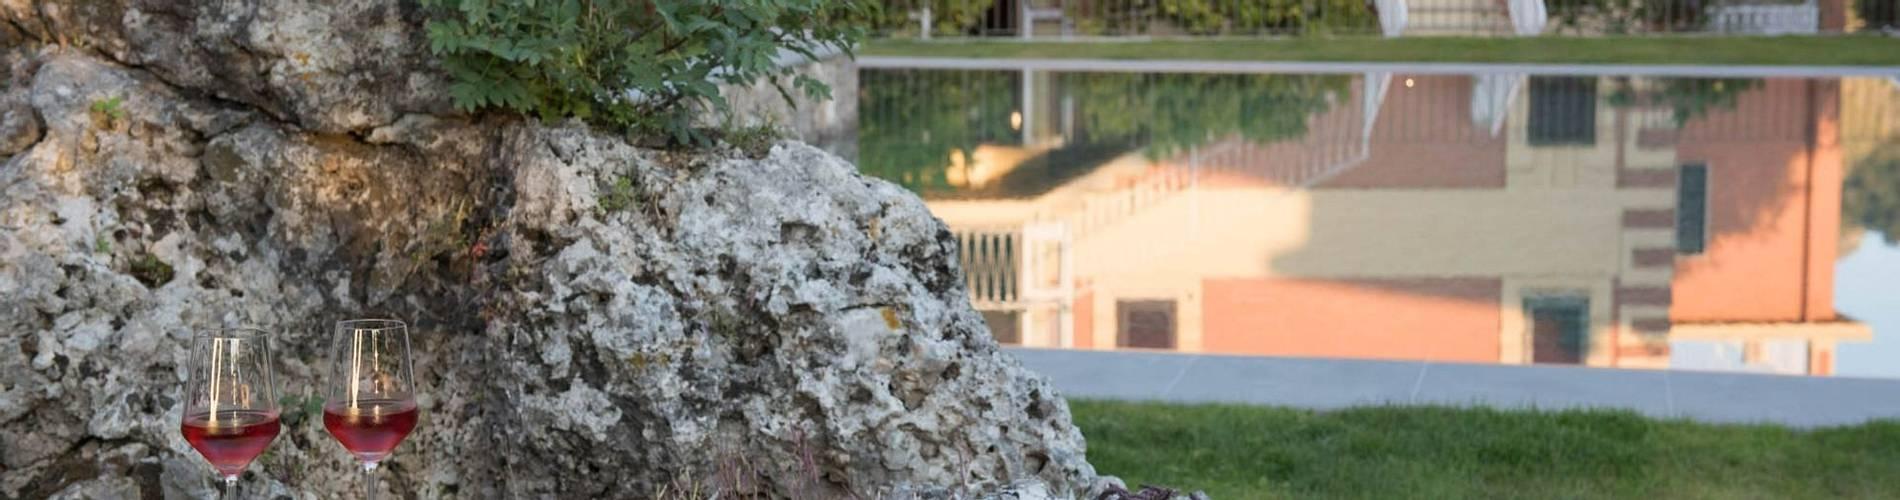 Villa Cheta, Basilicata, Italy (11).jpg